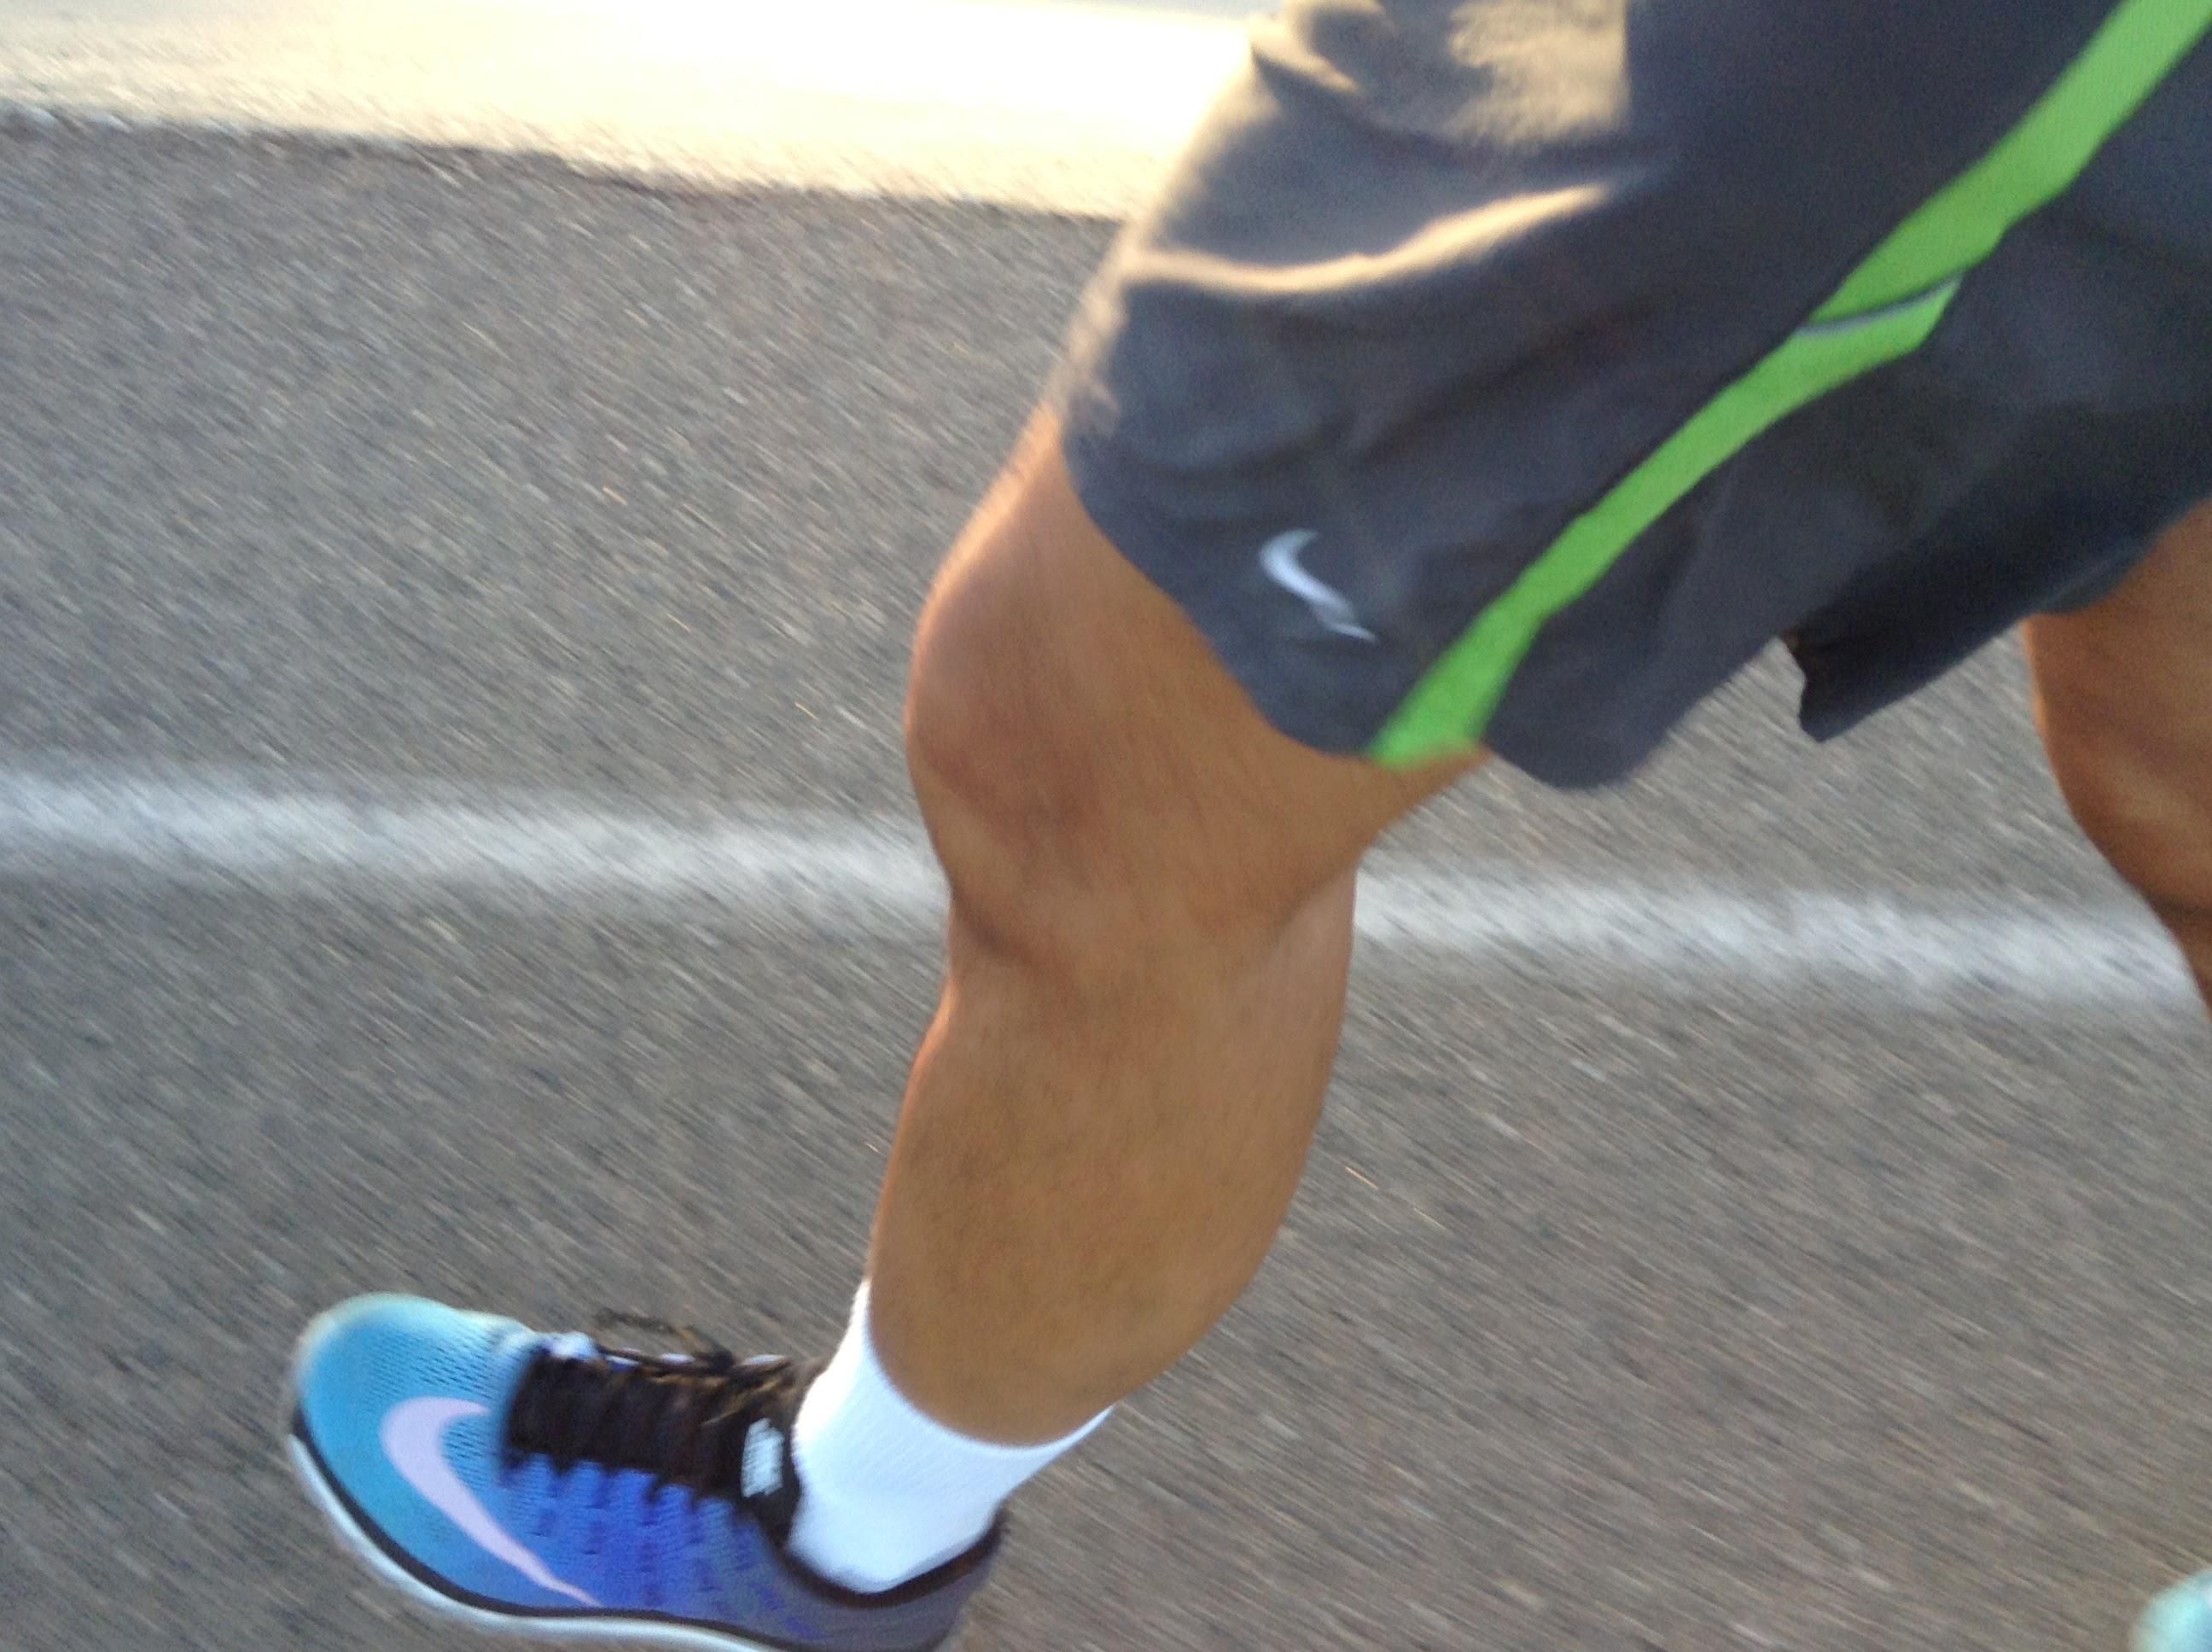 my blue Nike Air Max shoe striking down on the asphalt on the San Gabriel River bike path near Garvey & Rosemead in Rosemead